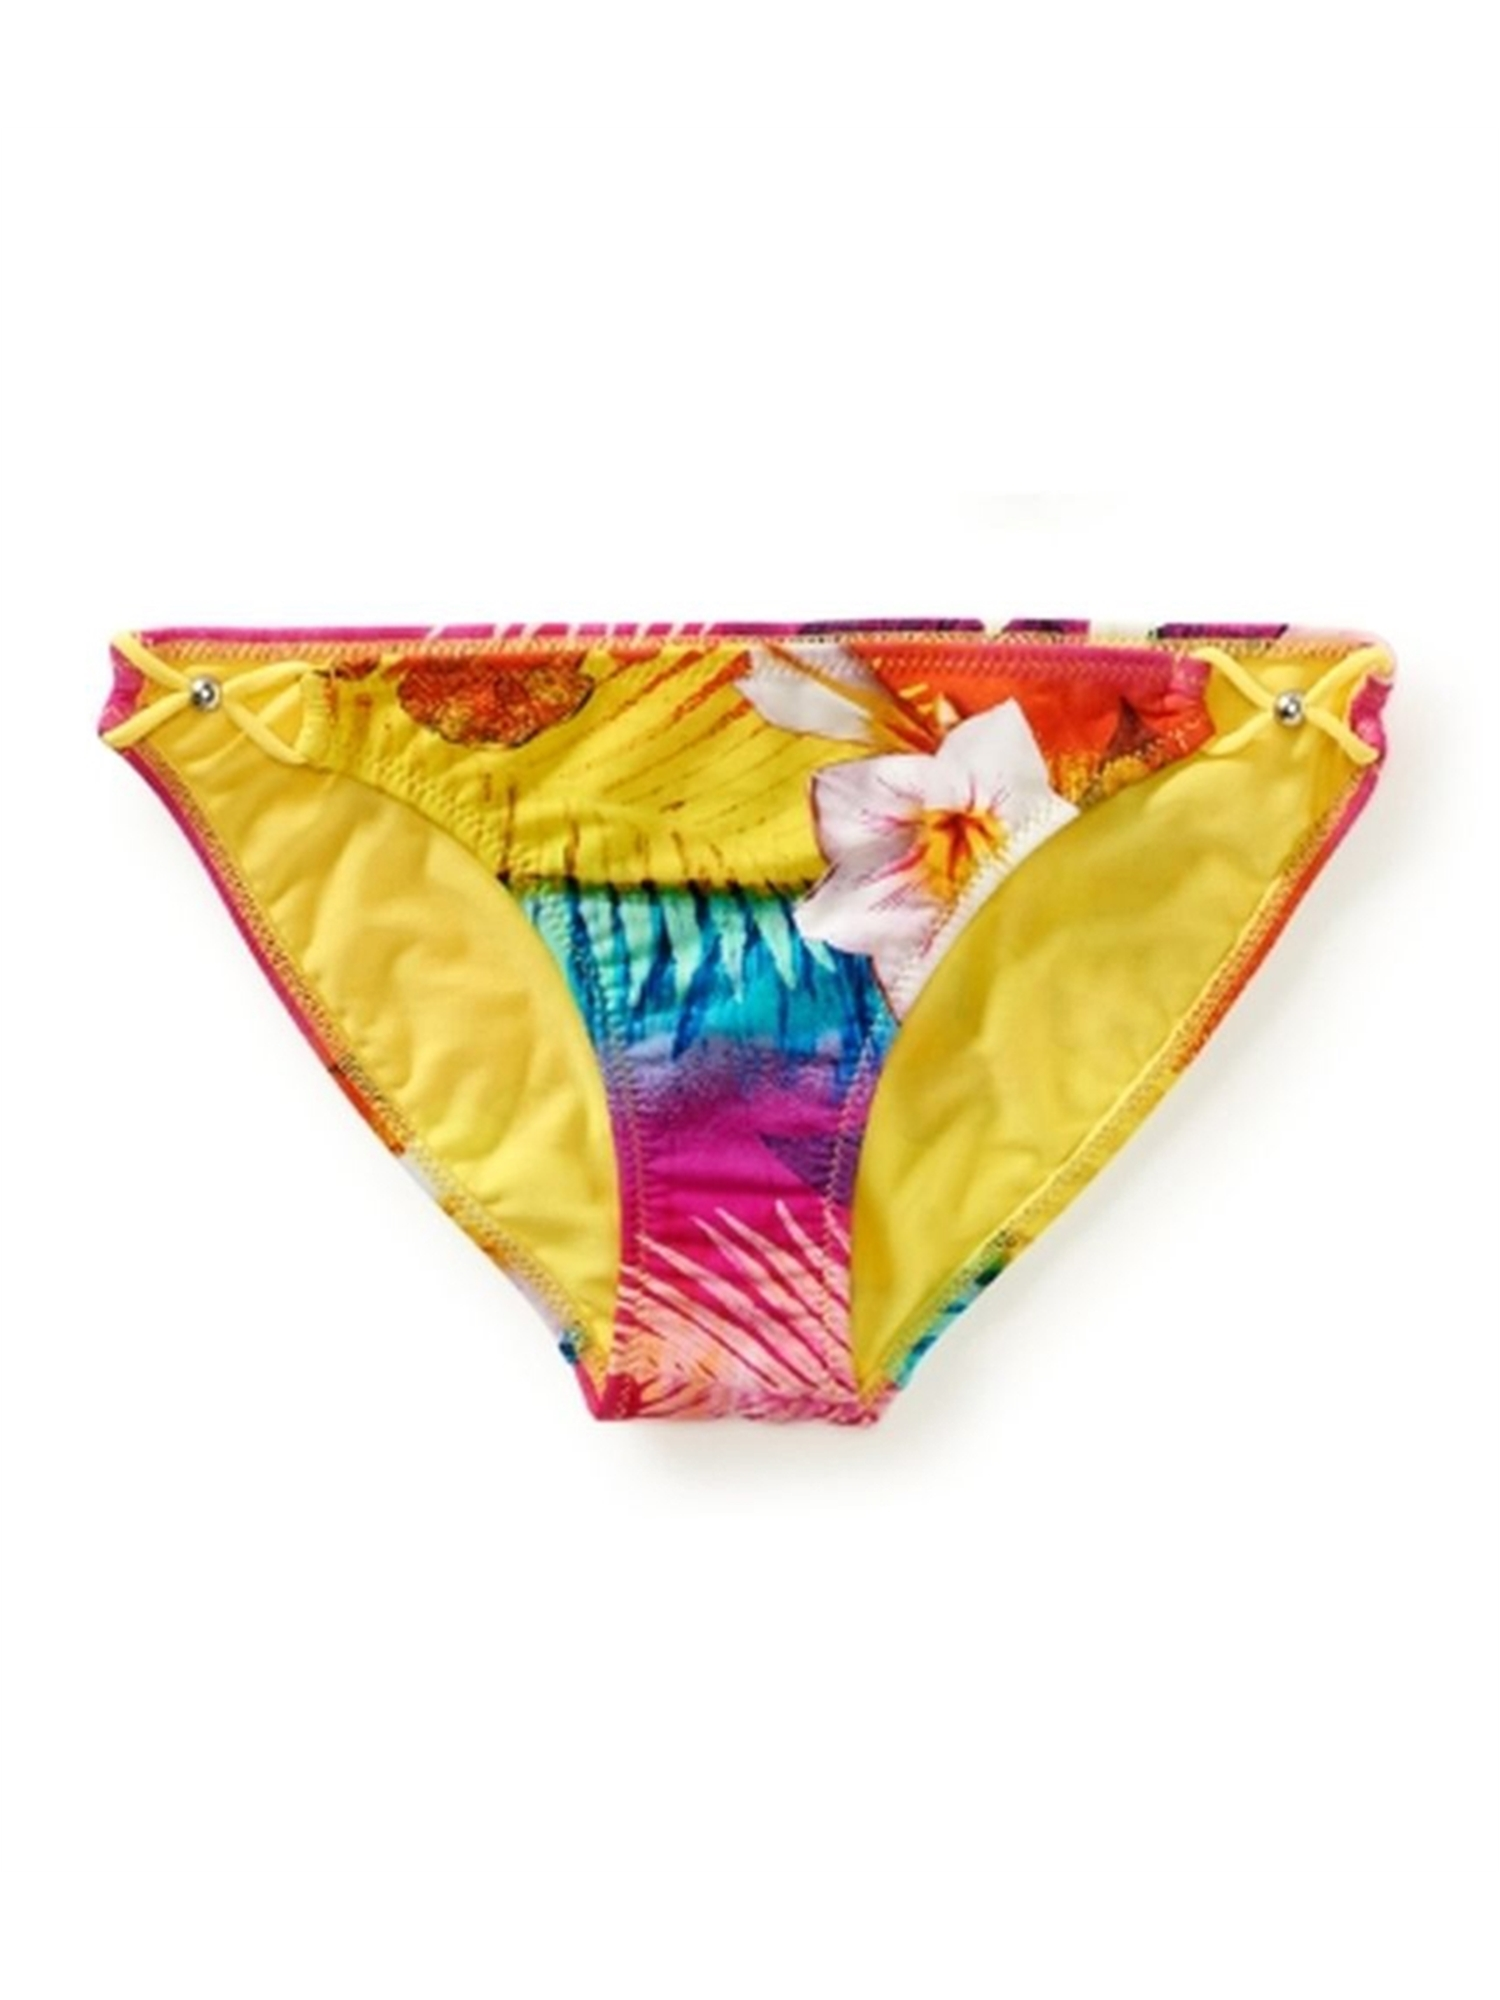 Aeropostale Juniors Tropical Bikini Swim Bottom